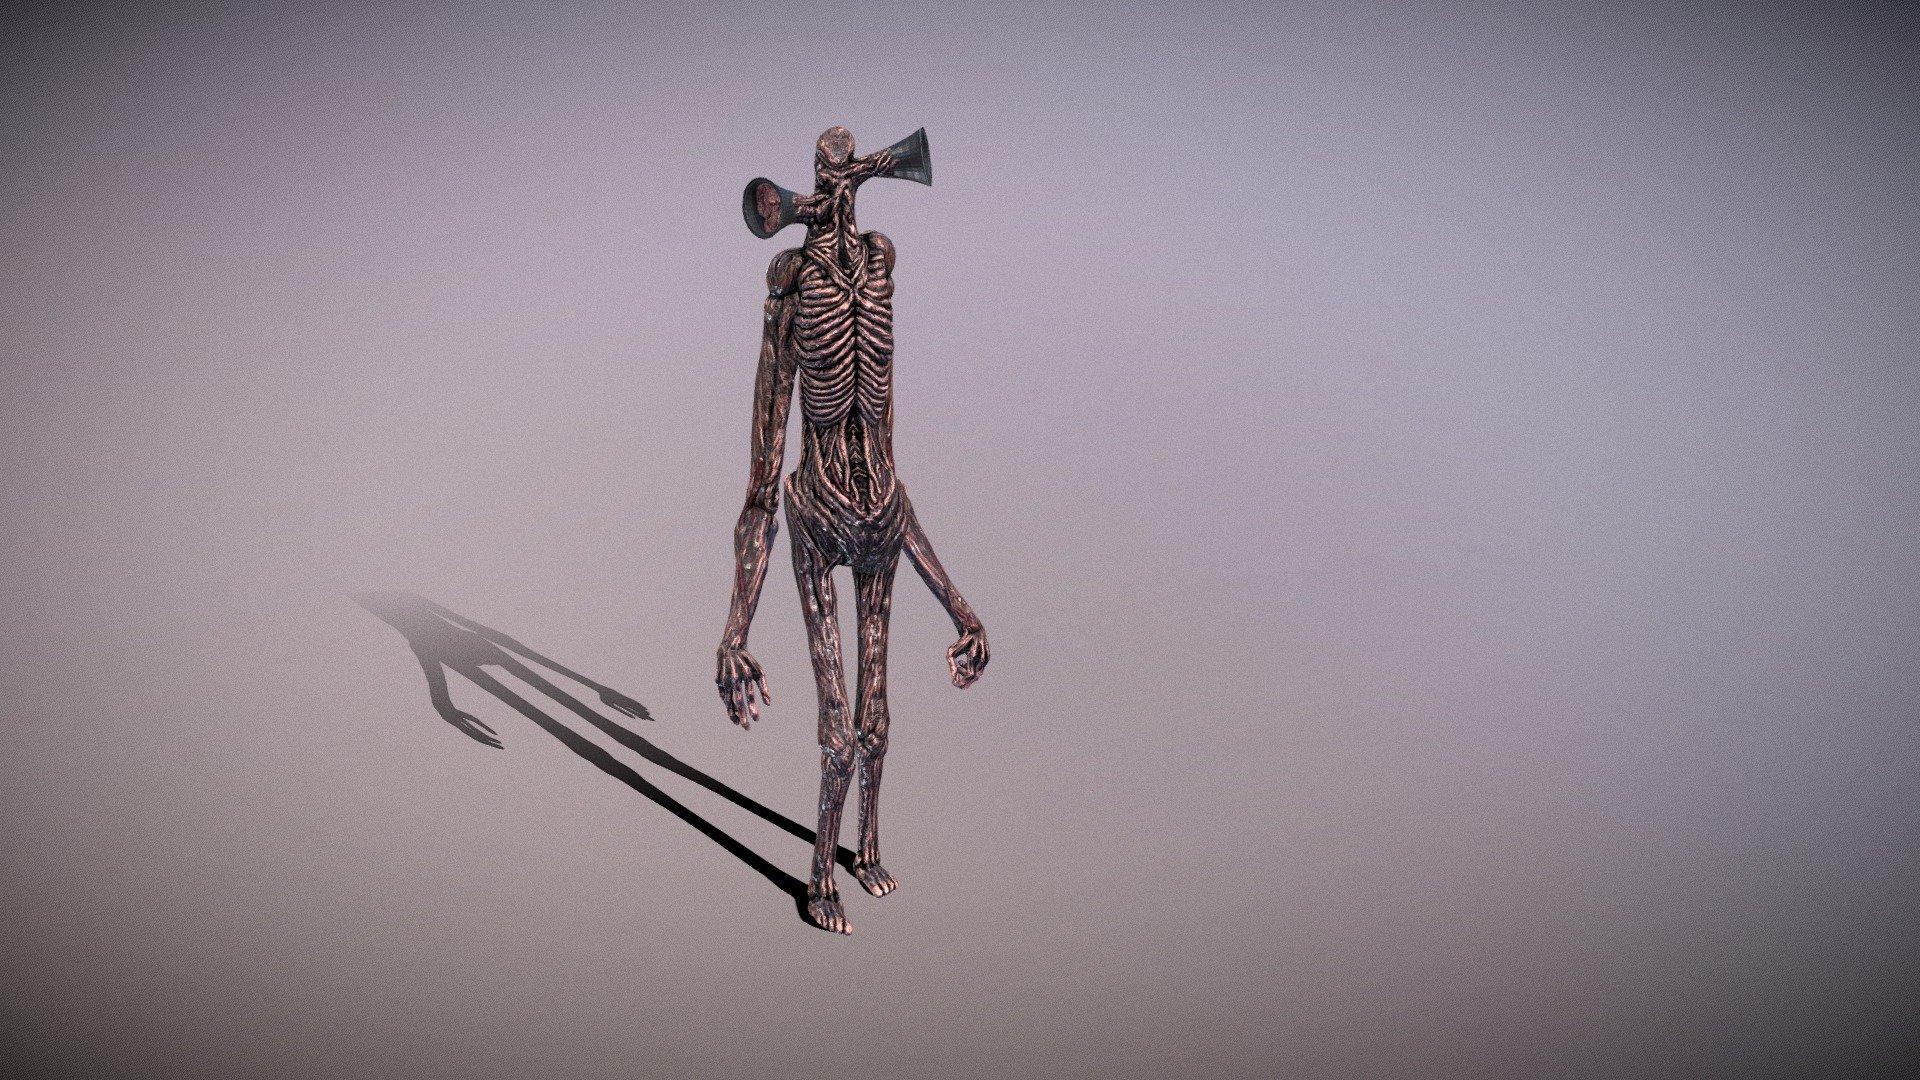 Sirenhead A Monster Created By Trevor Henderson 3d Model By Xweert123 Xweert123 Ac7e5e0 Sketchfab